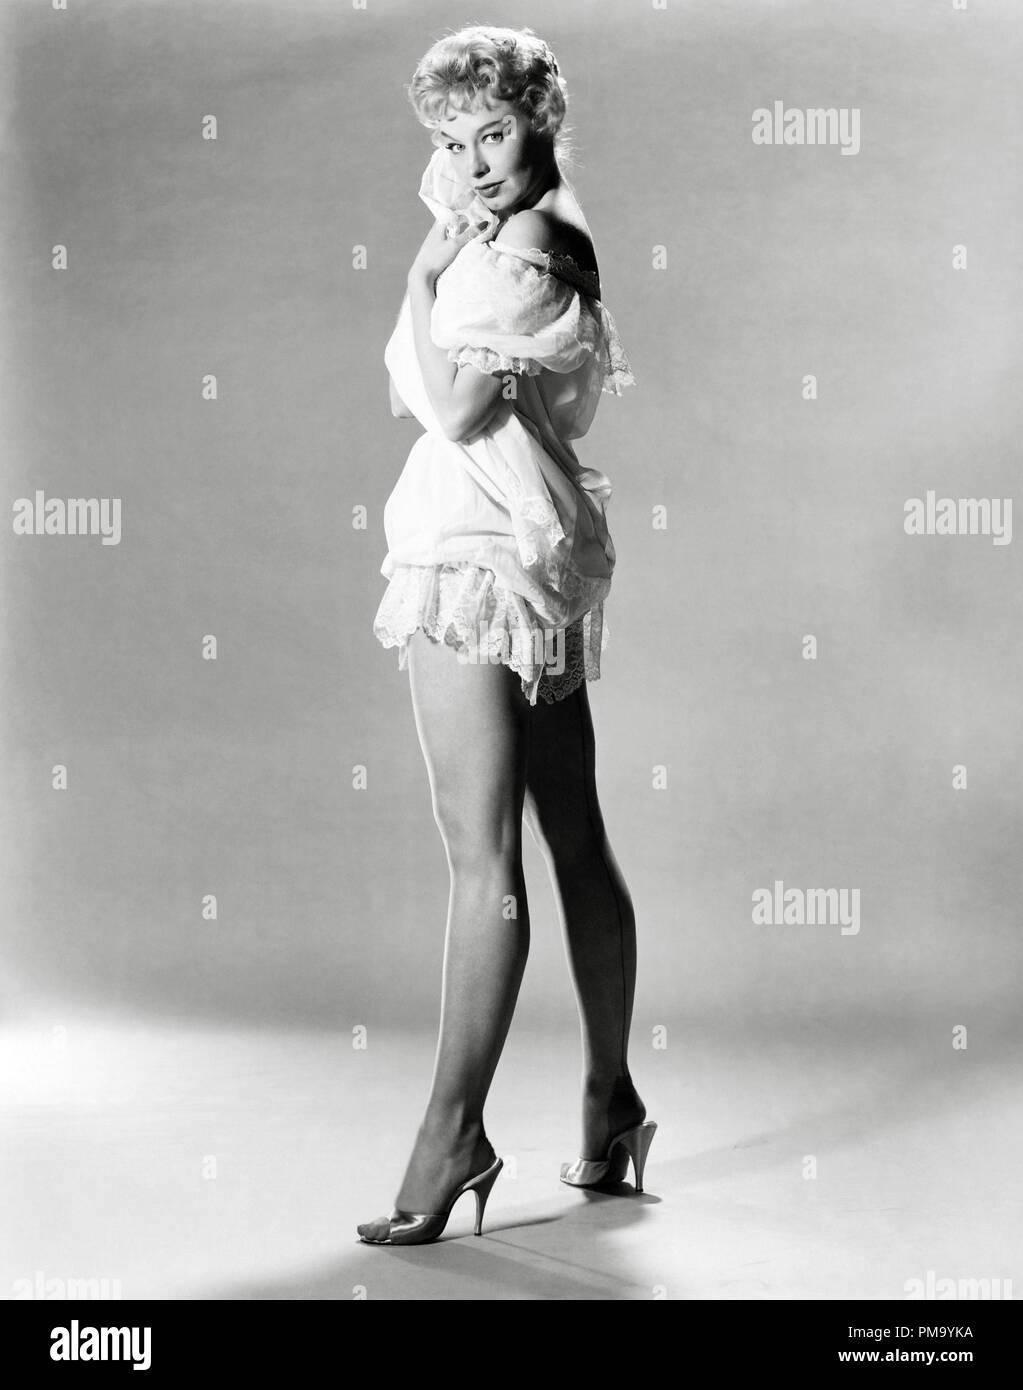 Studio Publicity Still: 'Son of Sinbad'  Lili St. Cyr  1955 RKO File Reference # 31780_210 - Stock Image